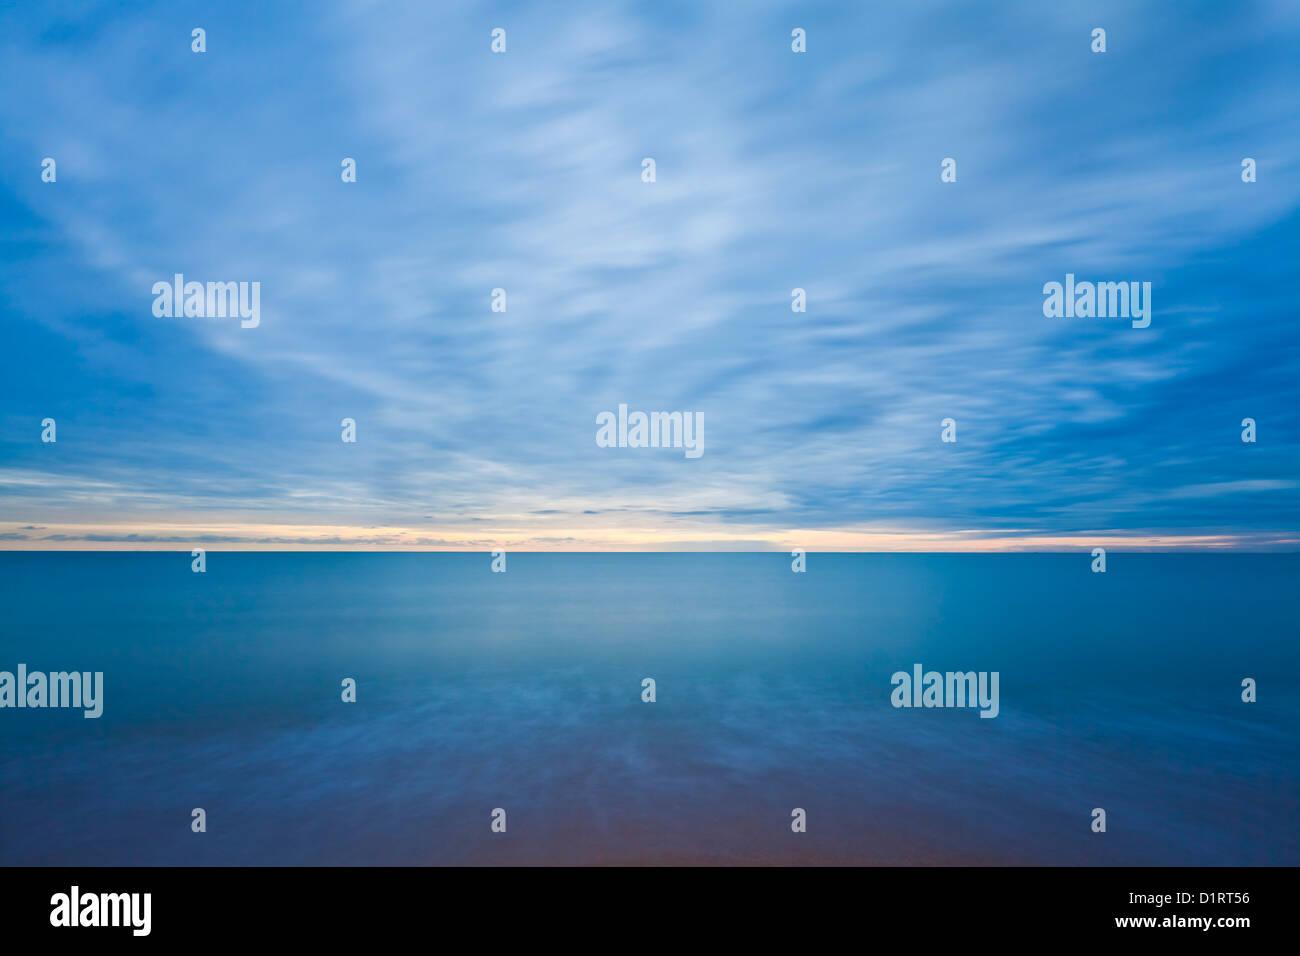 Blick auf den Horizont bei Sonnenuntergang mit einem schweren Himmel aber klaren Horizont England UK GB EU Europa Stockbild